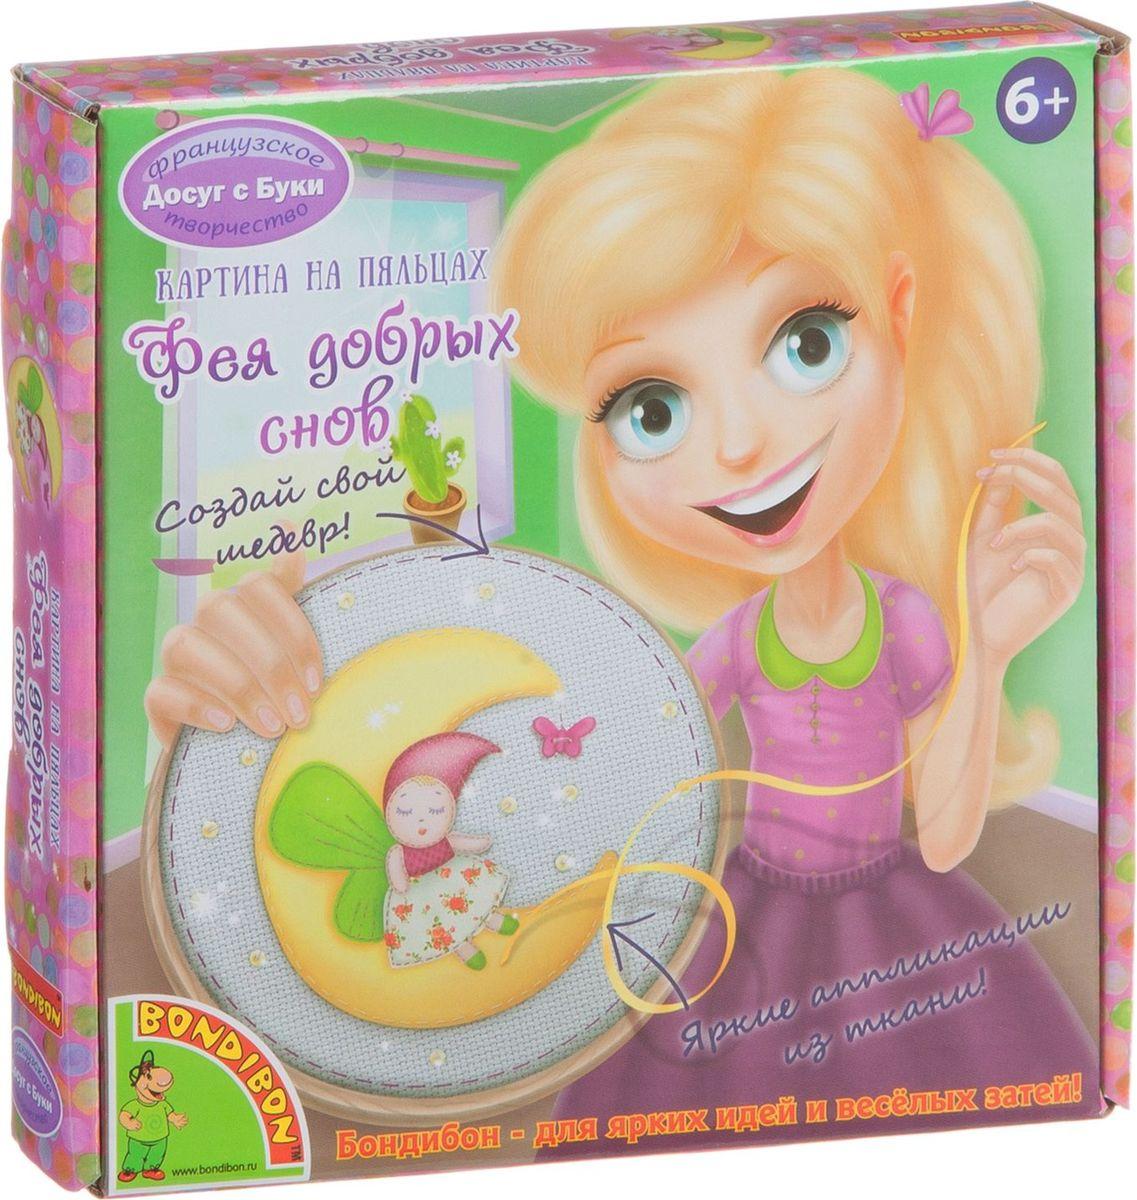 все цены на Bondibon Набор для вышивания картины на пяльцах Фея добрых снов онлайн